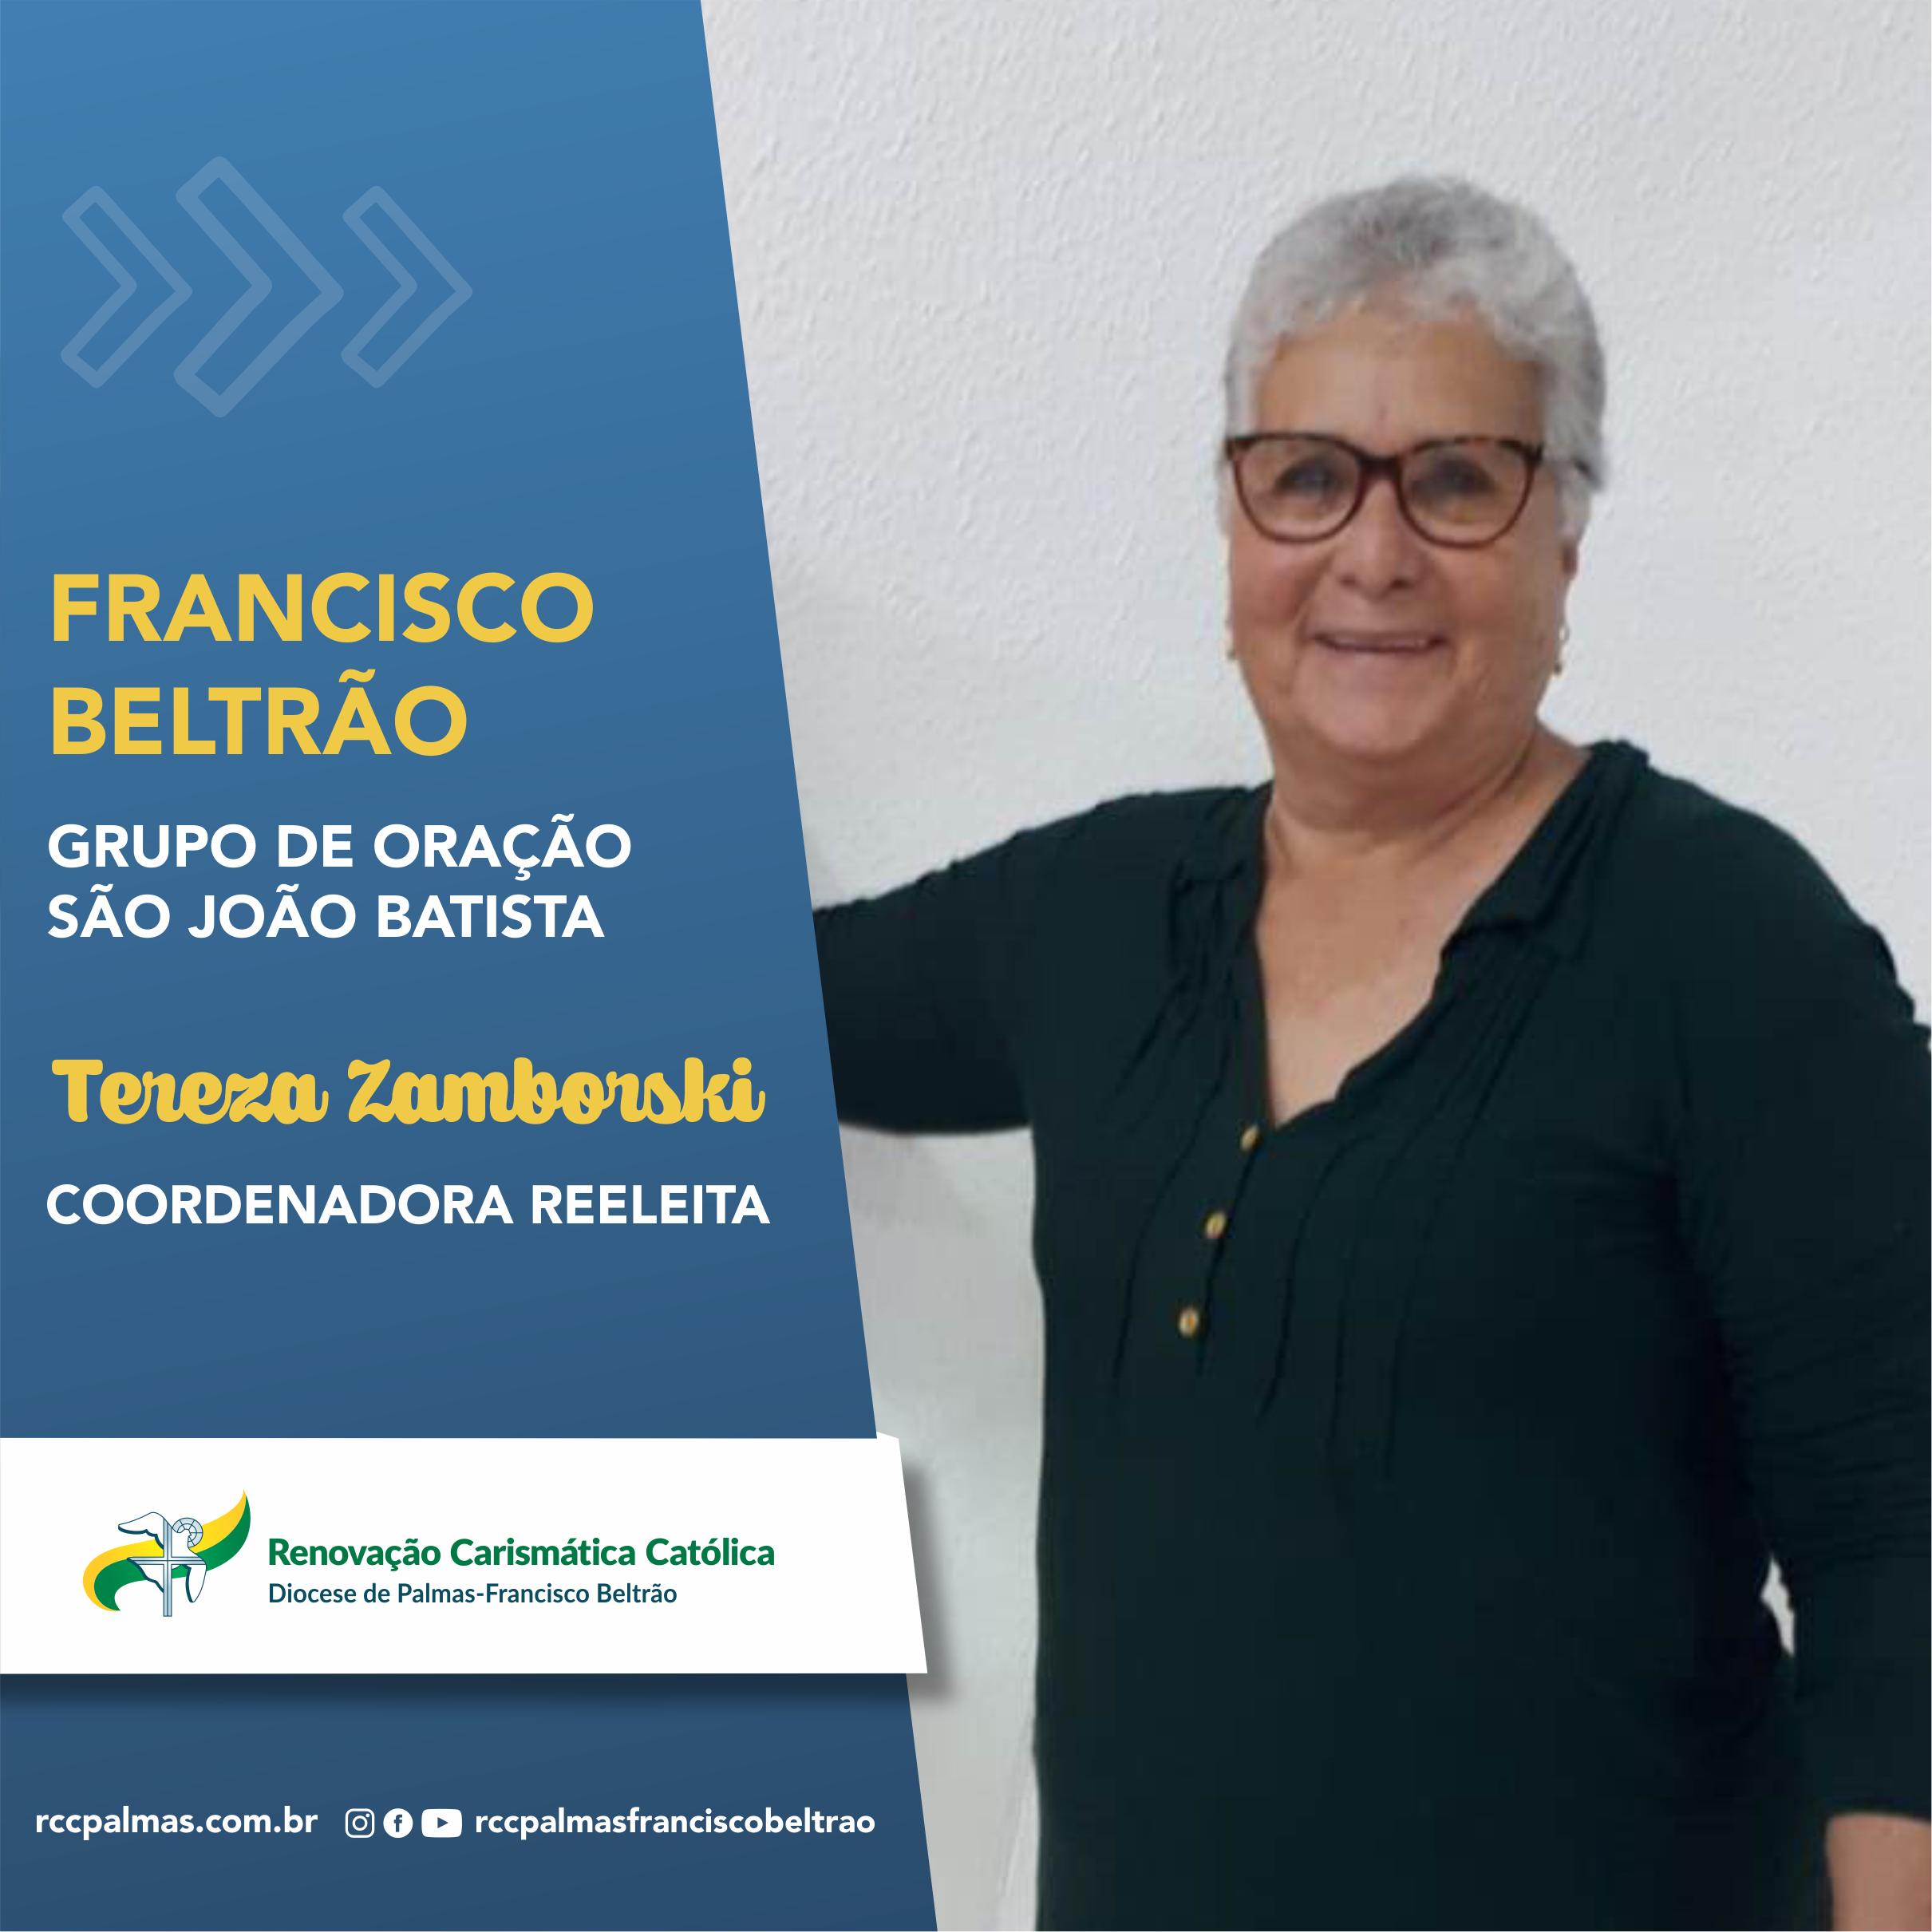 18 FRANCISCO BELTRAO - SAO JOAO BATISTA